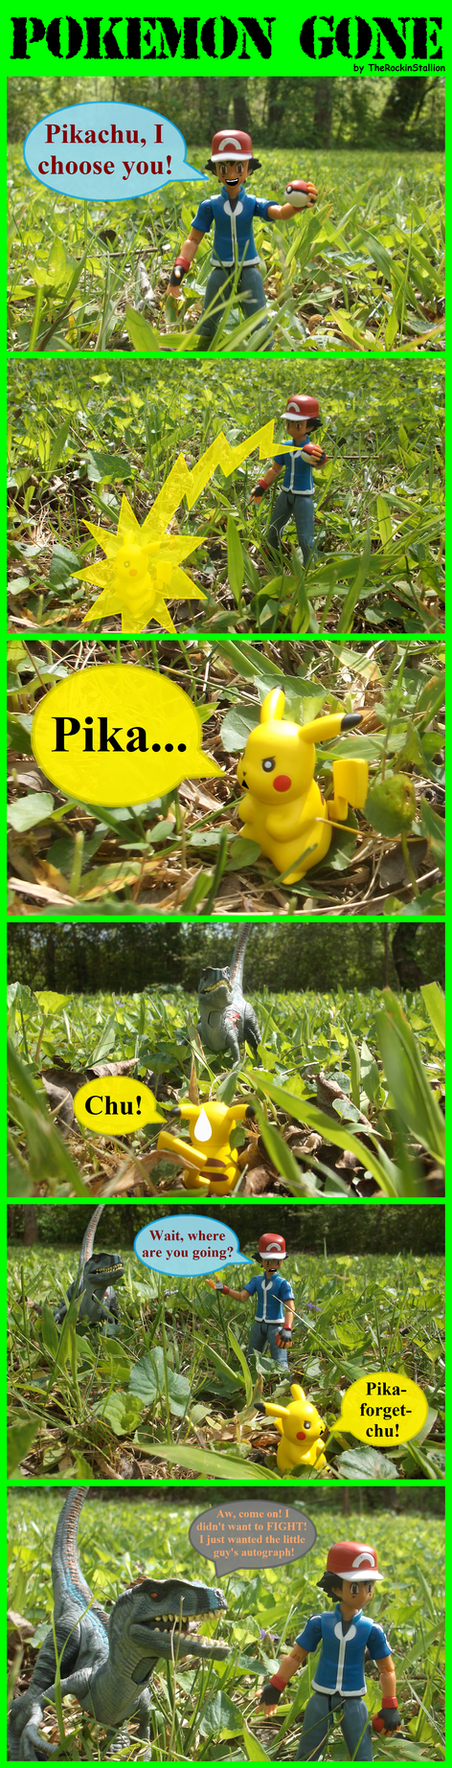 Pokemon Gone by TheRockinStallion